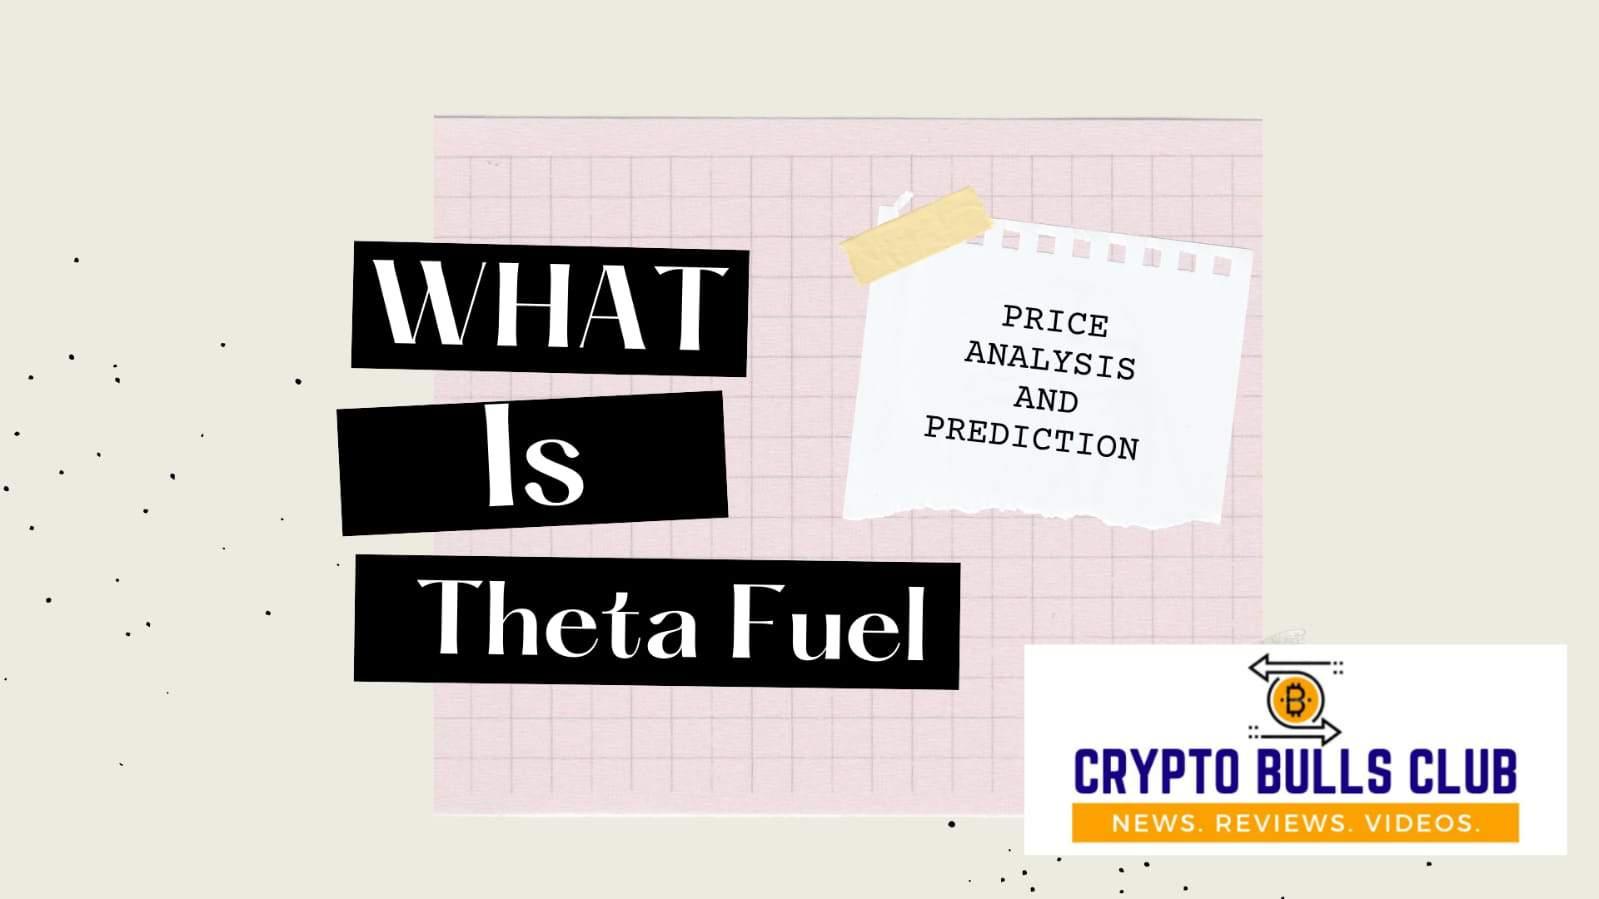 TFuel price prediction